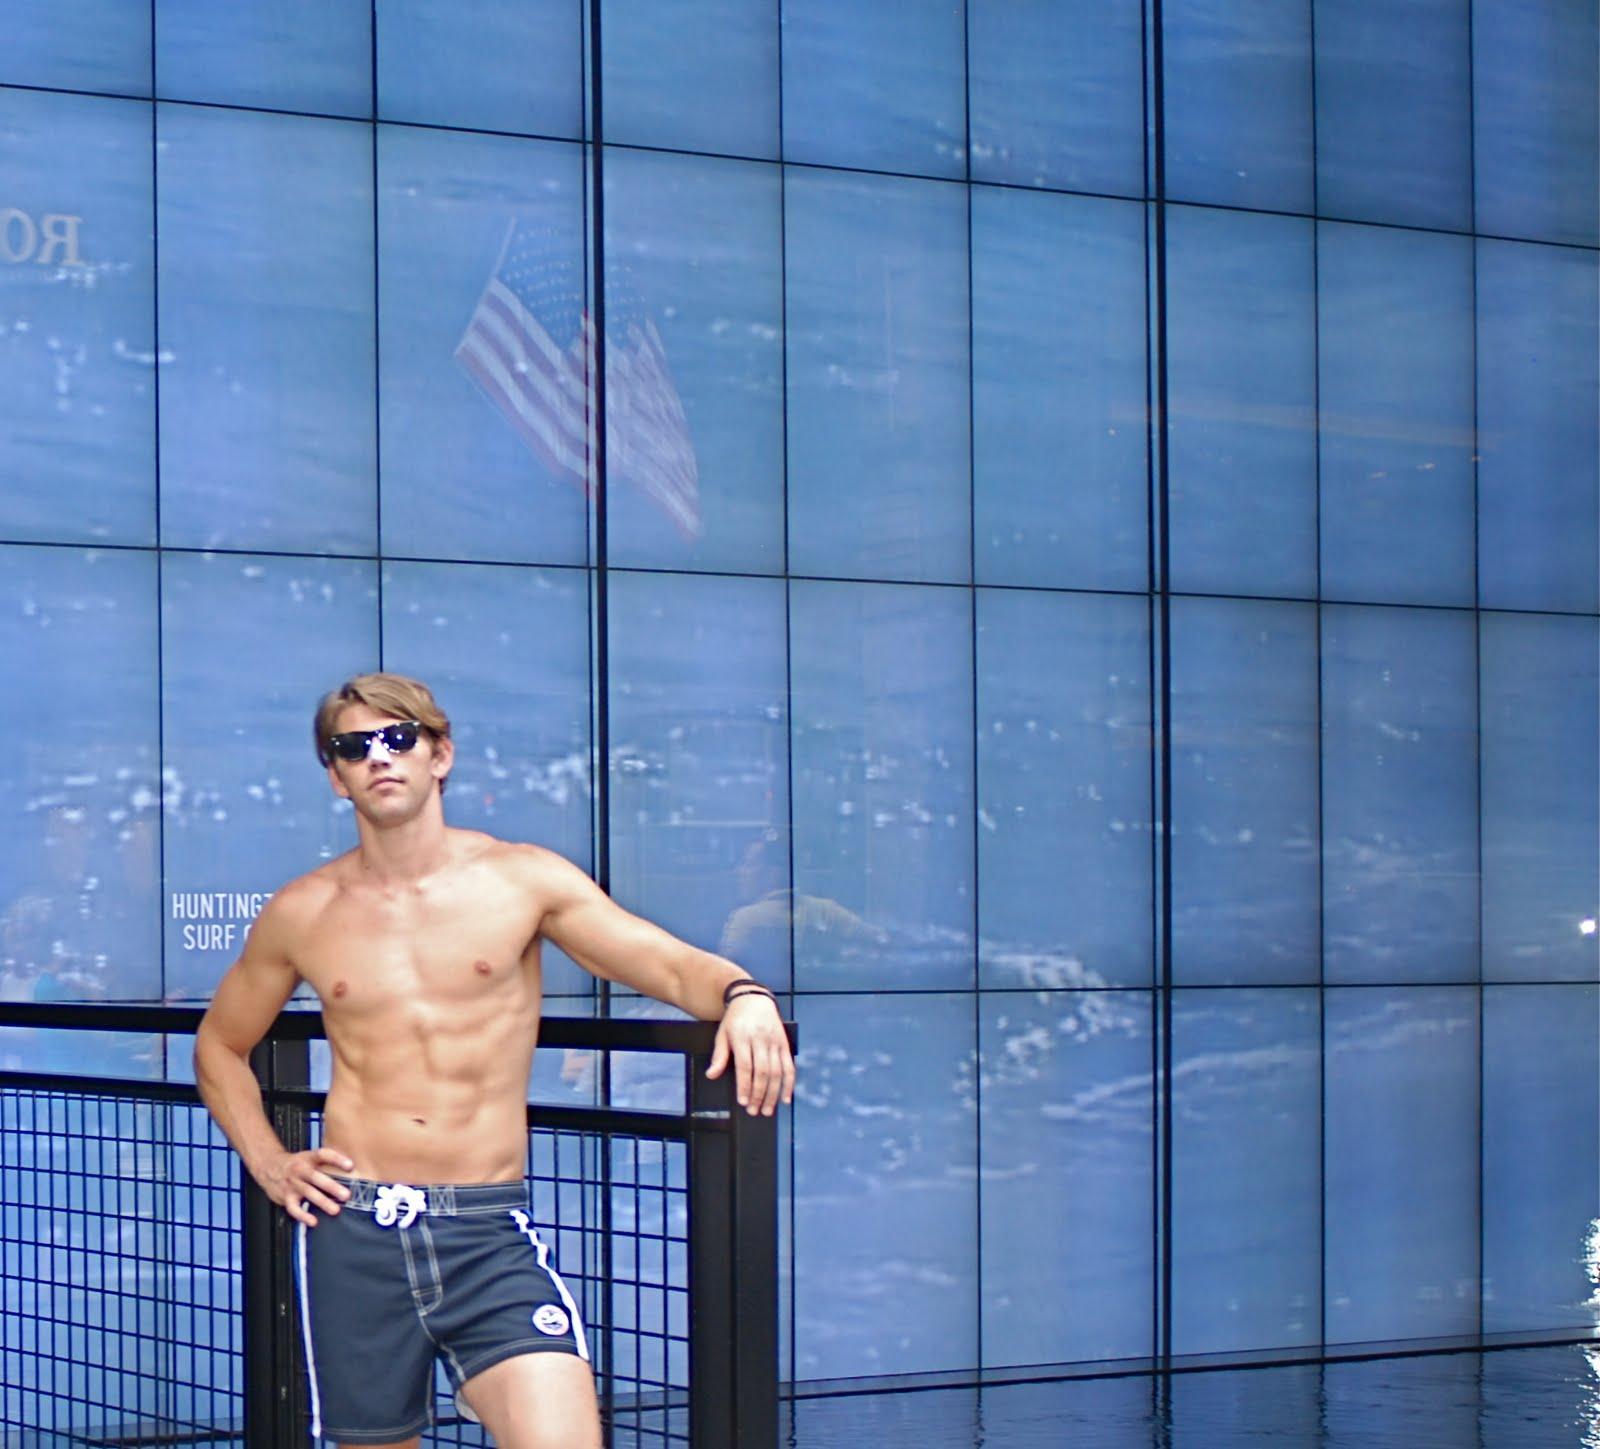 Nicky Whelan Maxim August 2014 / 1080p - Video Dailymotion Bassetti photo coupon code